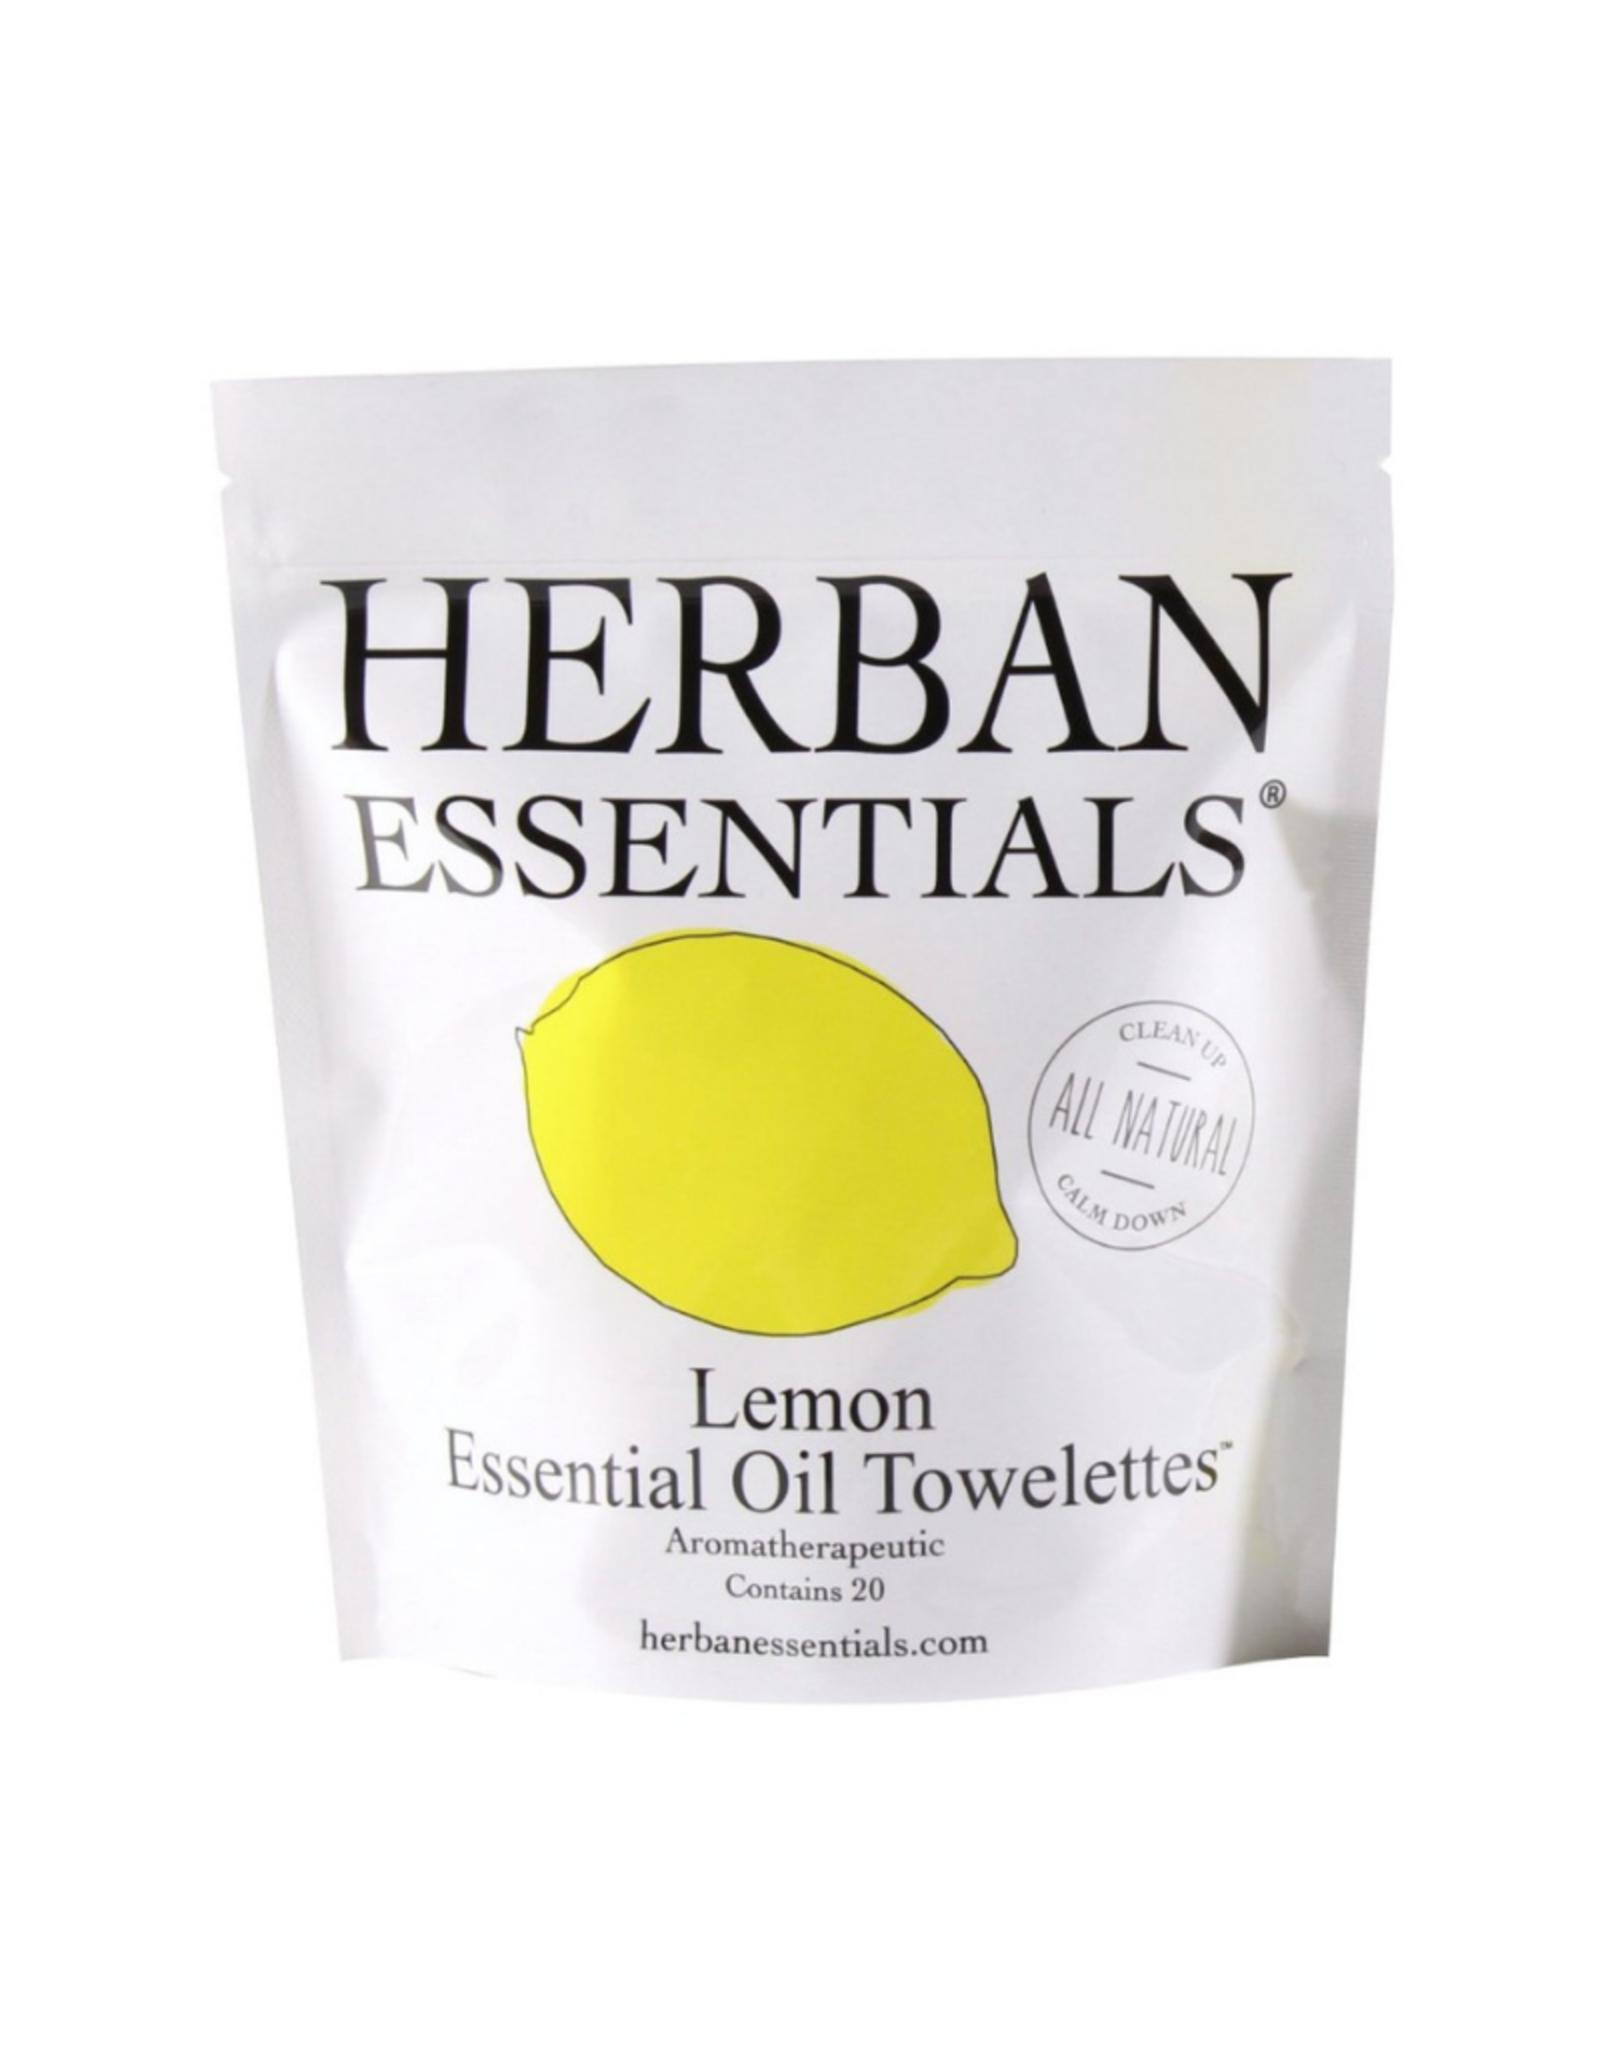 Herban Essentials Lemon Toweletts